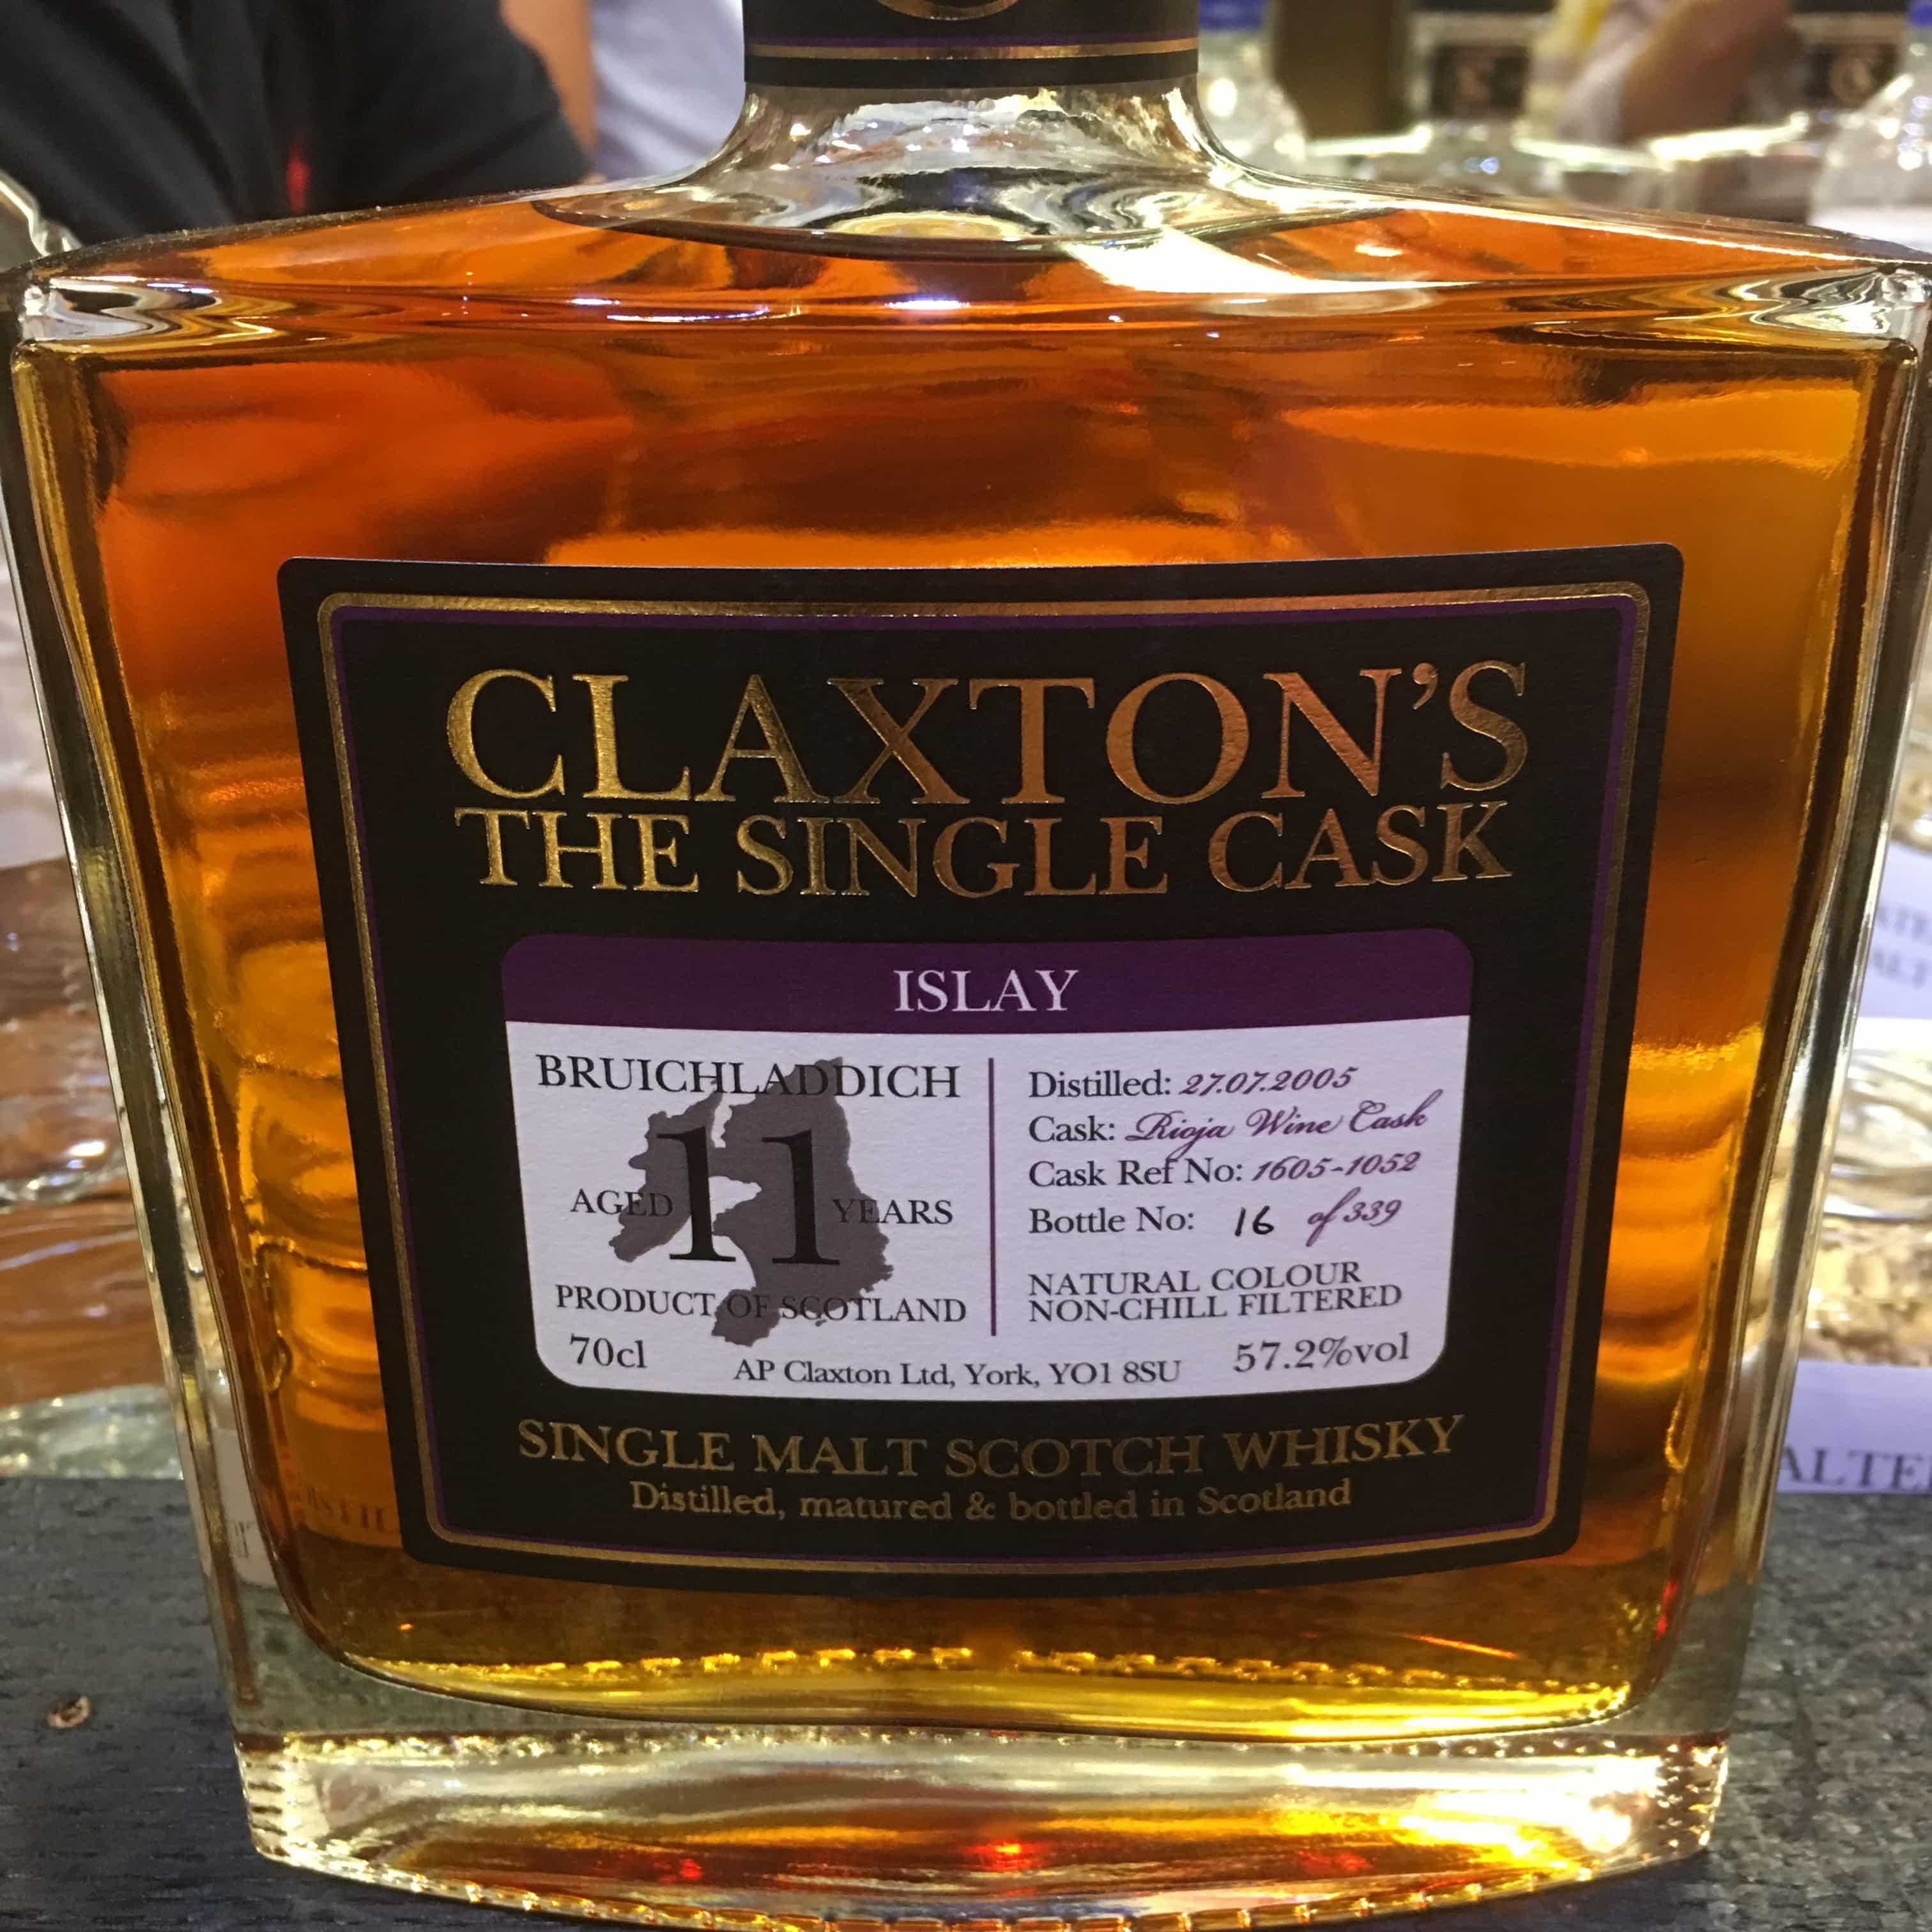 Claxton's Bruichladdich 11